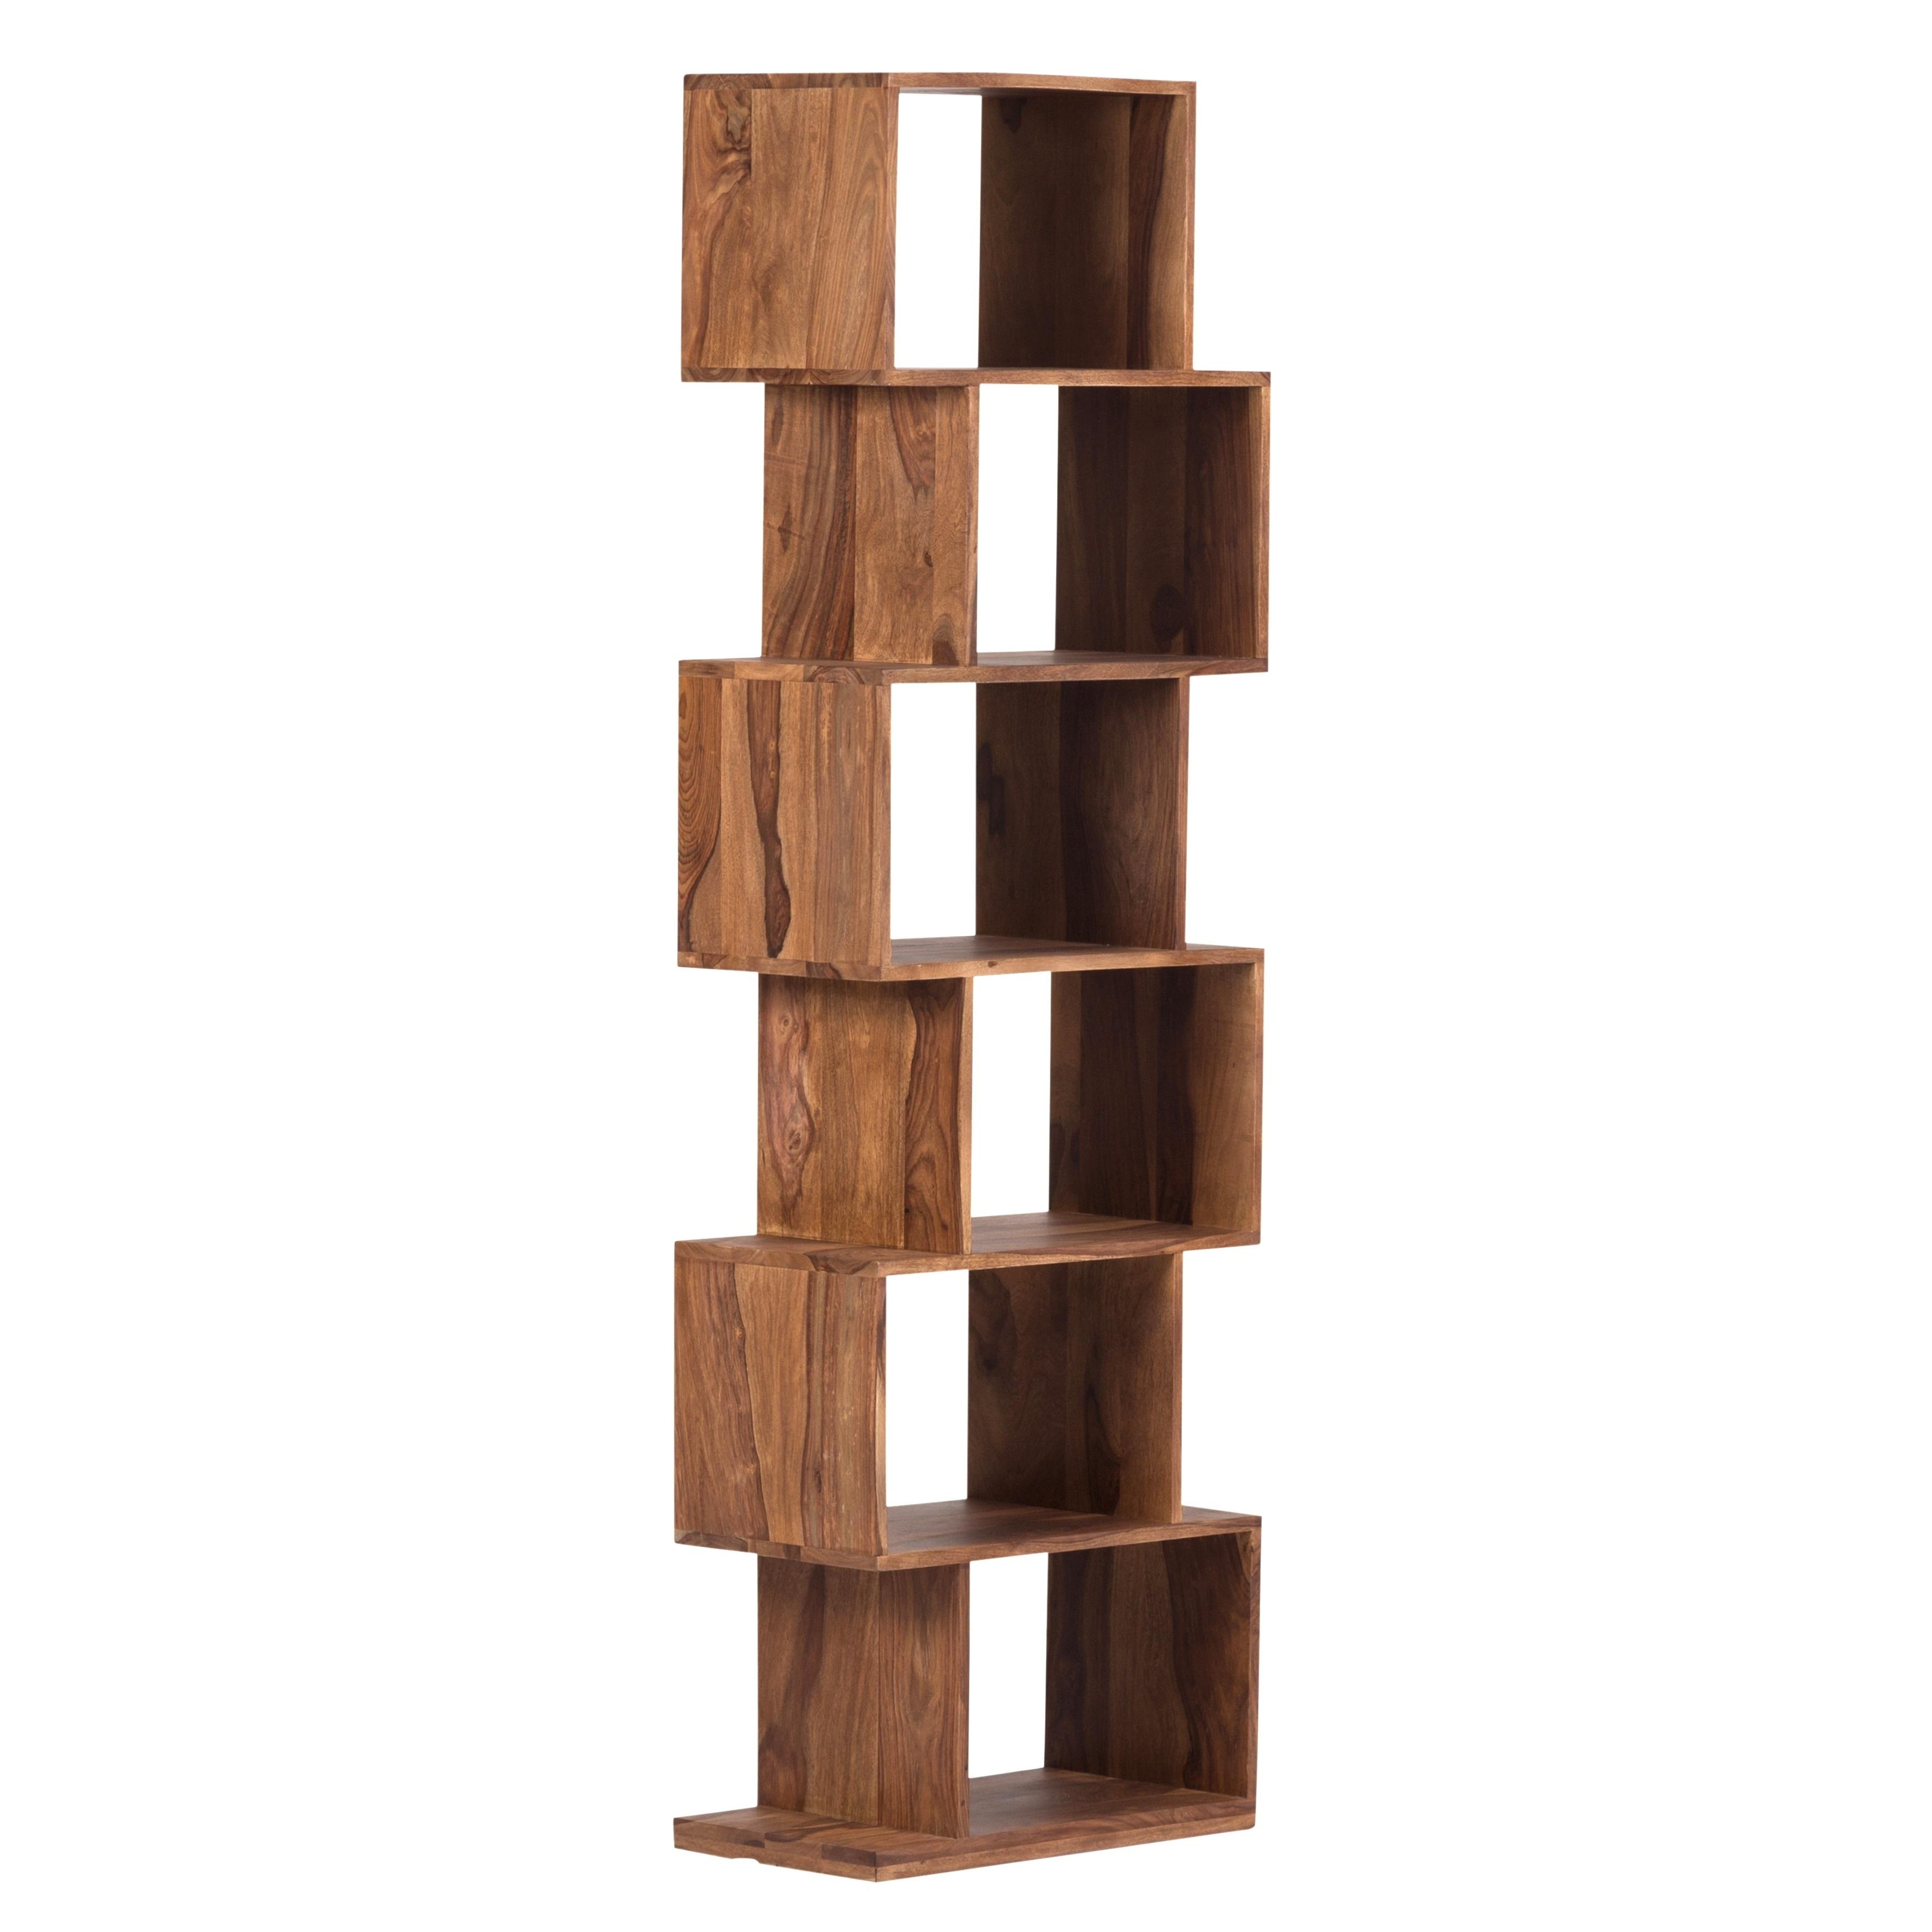 Urban Mid Century Modern Sheesham Wood Bookshelf 6 Shelves